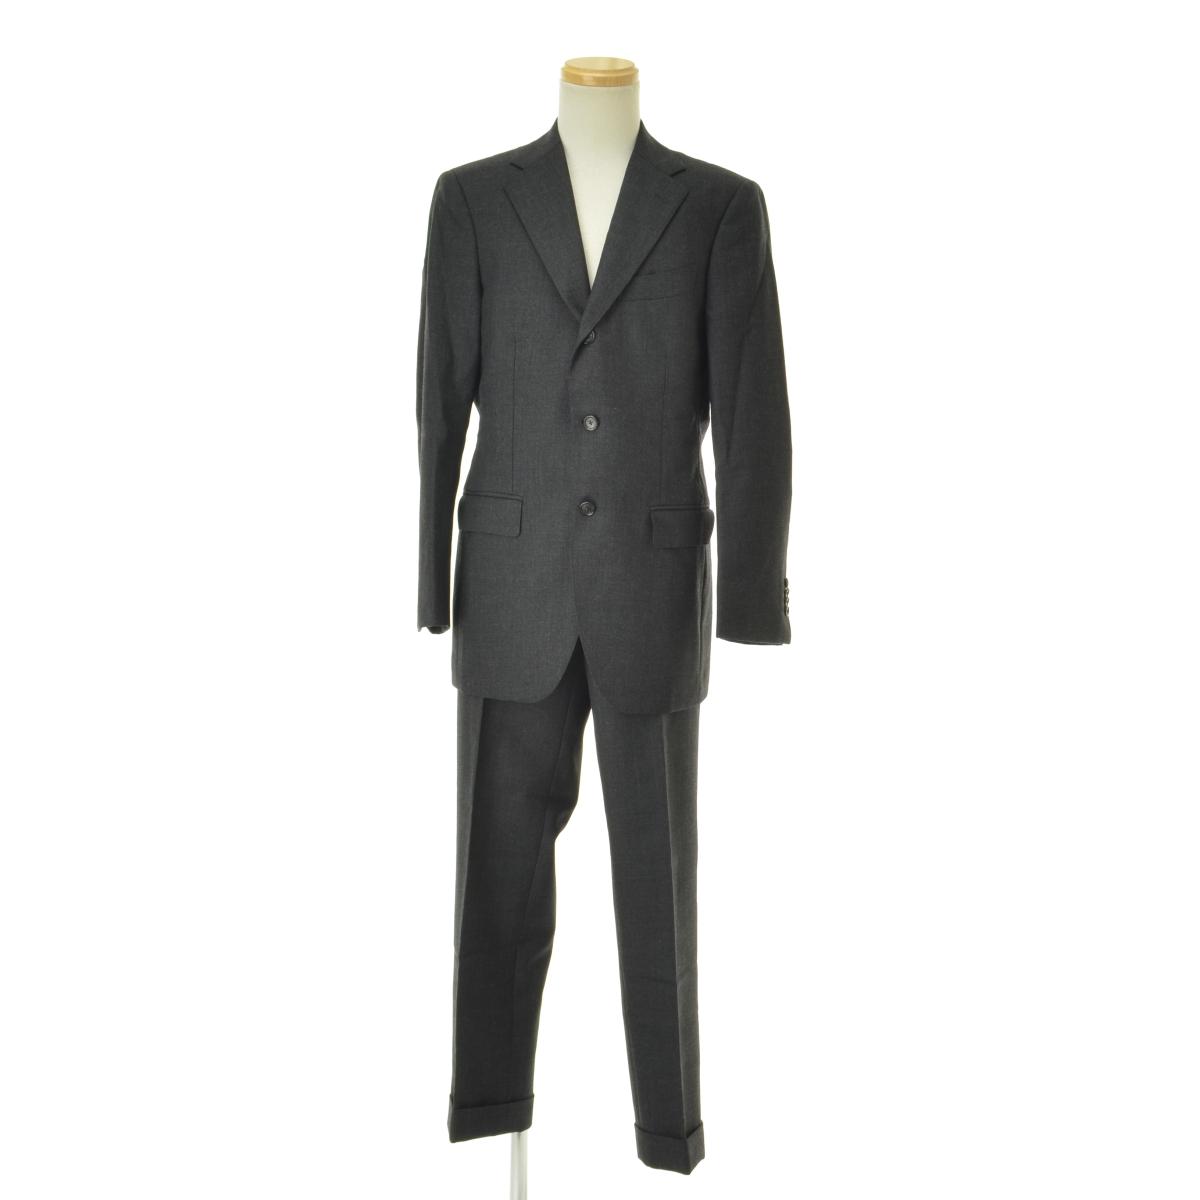 BEAMS / ビームスCustom Tailor BEAMS kynochカイノック 3ボタンウールスーツ【cacaaecd-m】